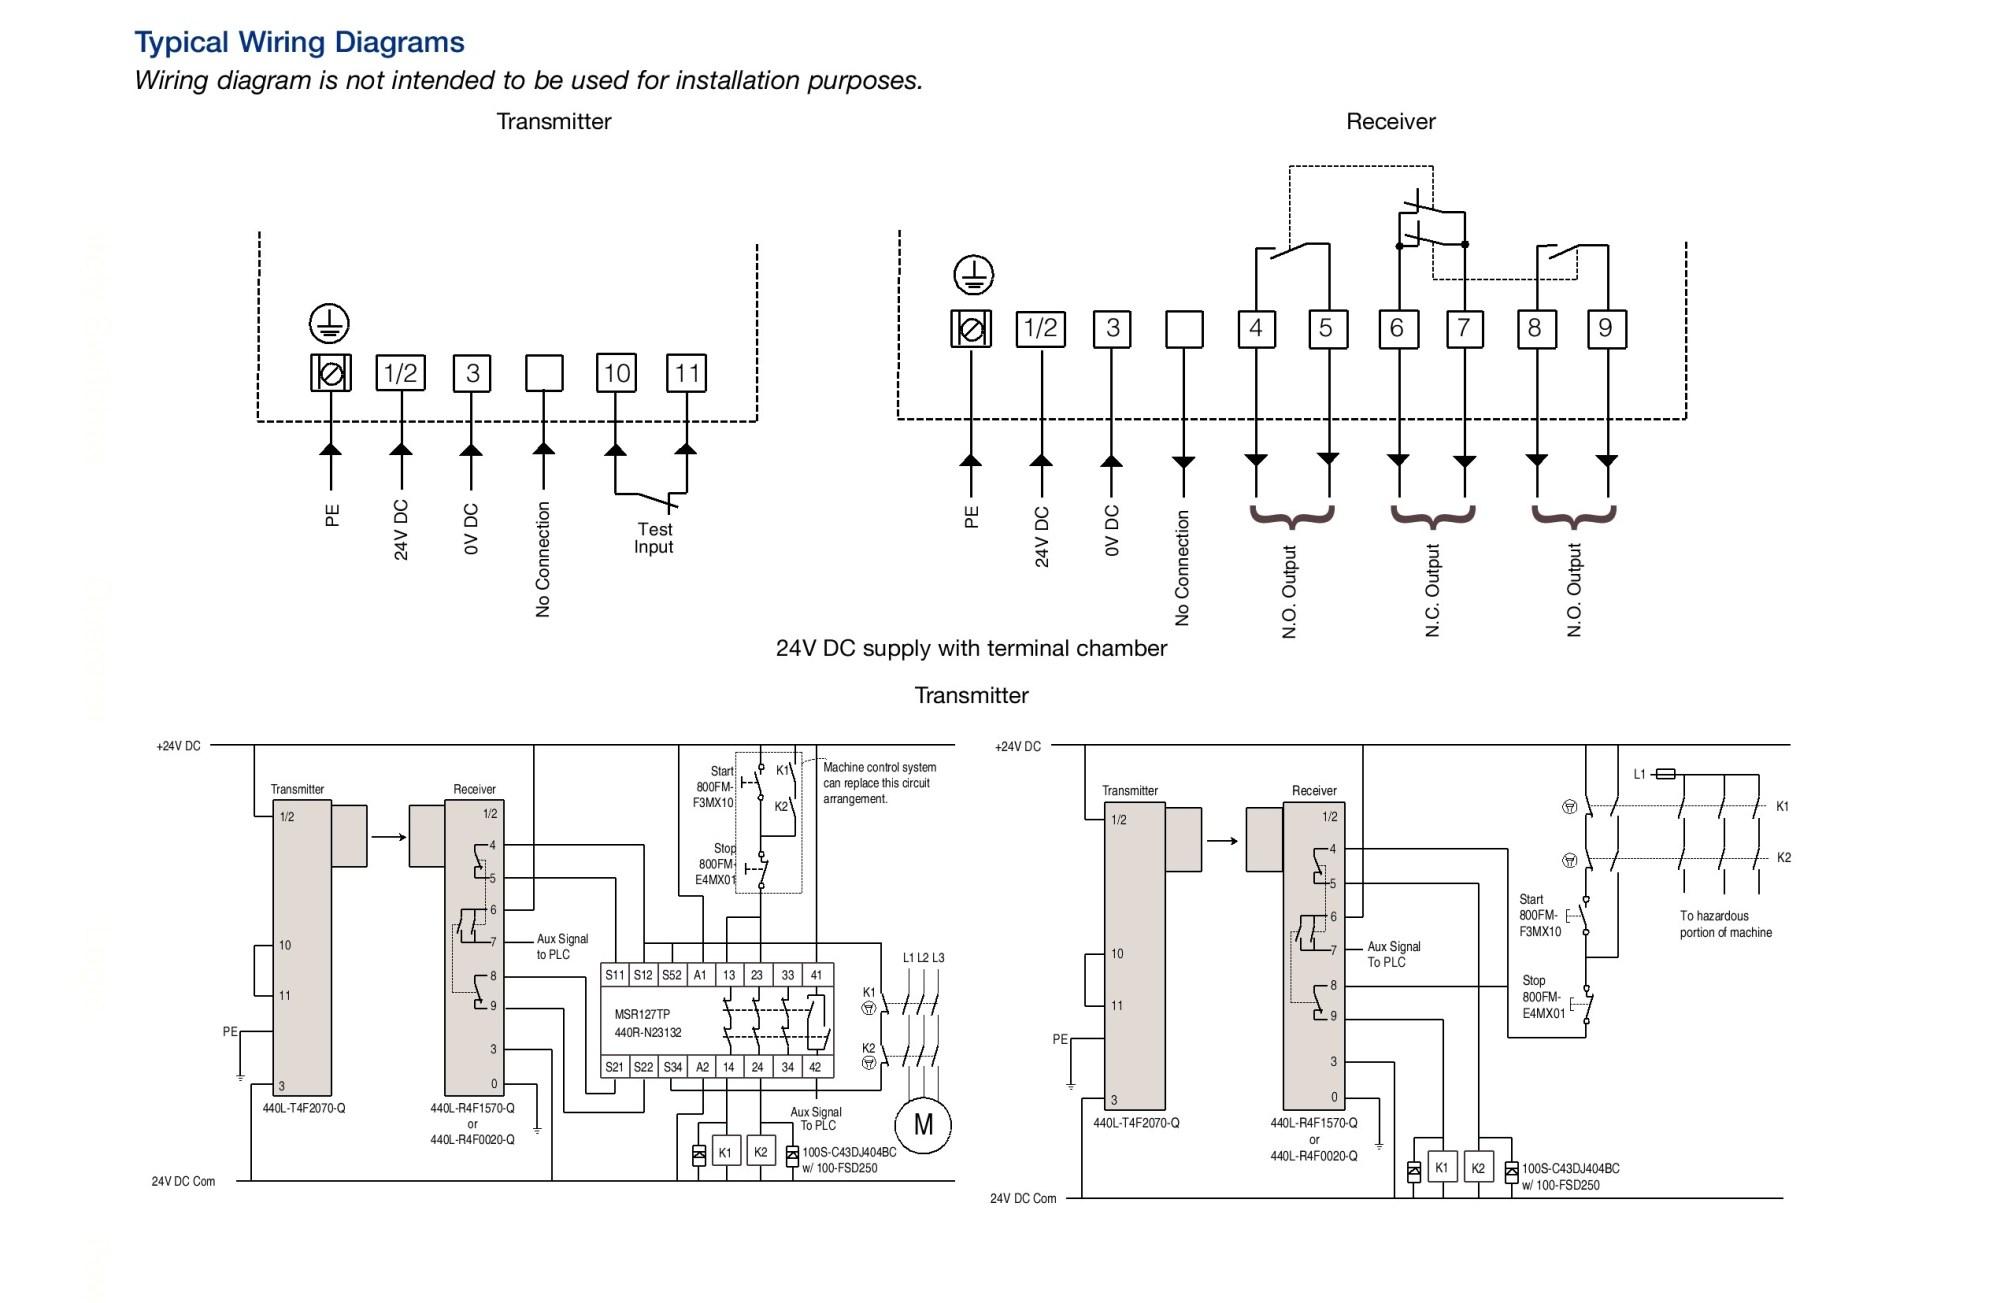 hight resolution of 1947 dodge headlight switch wiring diagram dodge auto dodge ram 1500 wiring diagram dodge wiring harness diagram